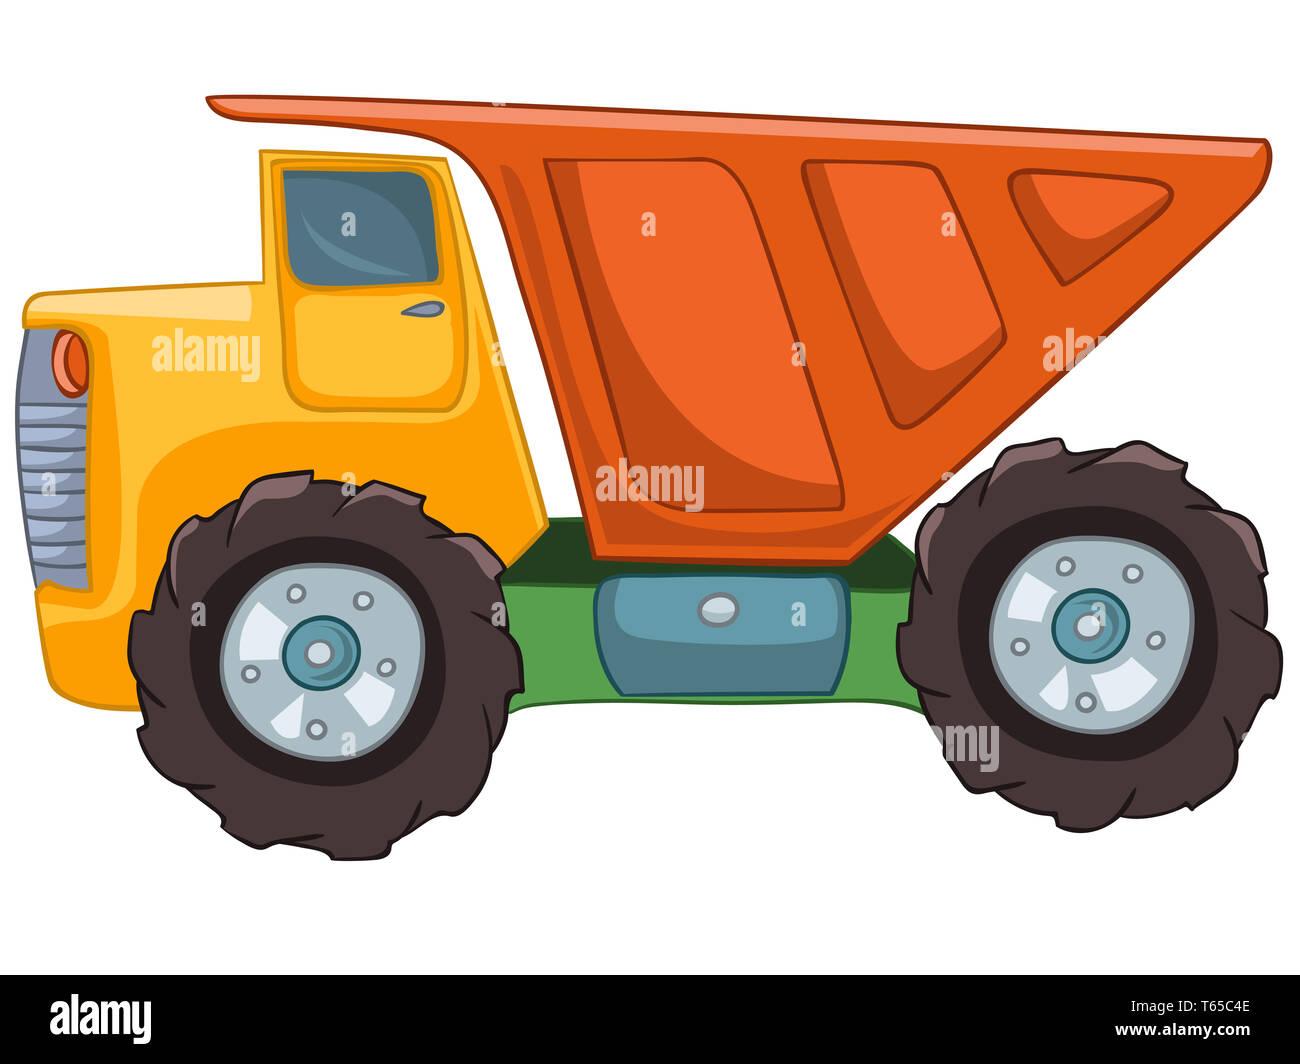 Cartoon Truck Stock Photo Alamy